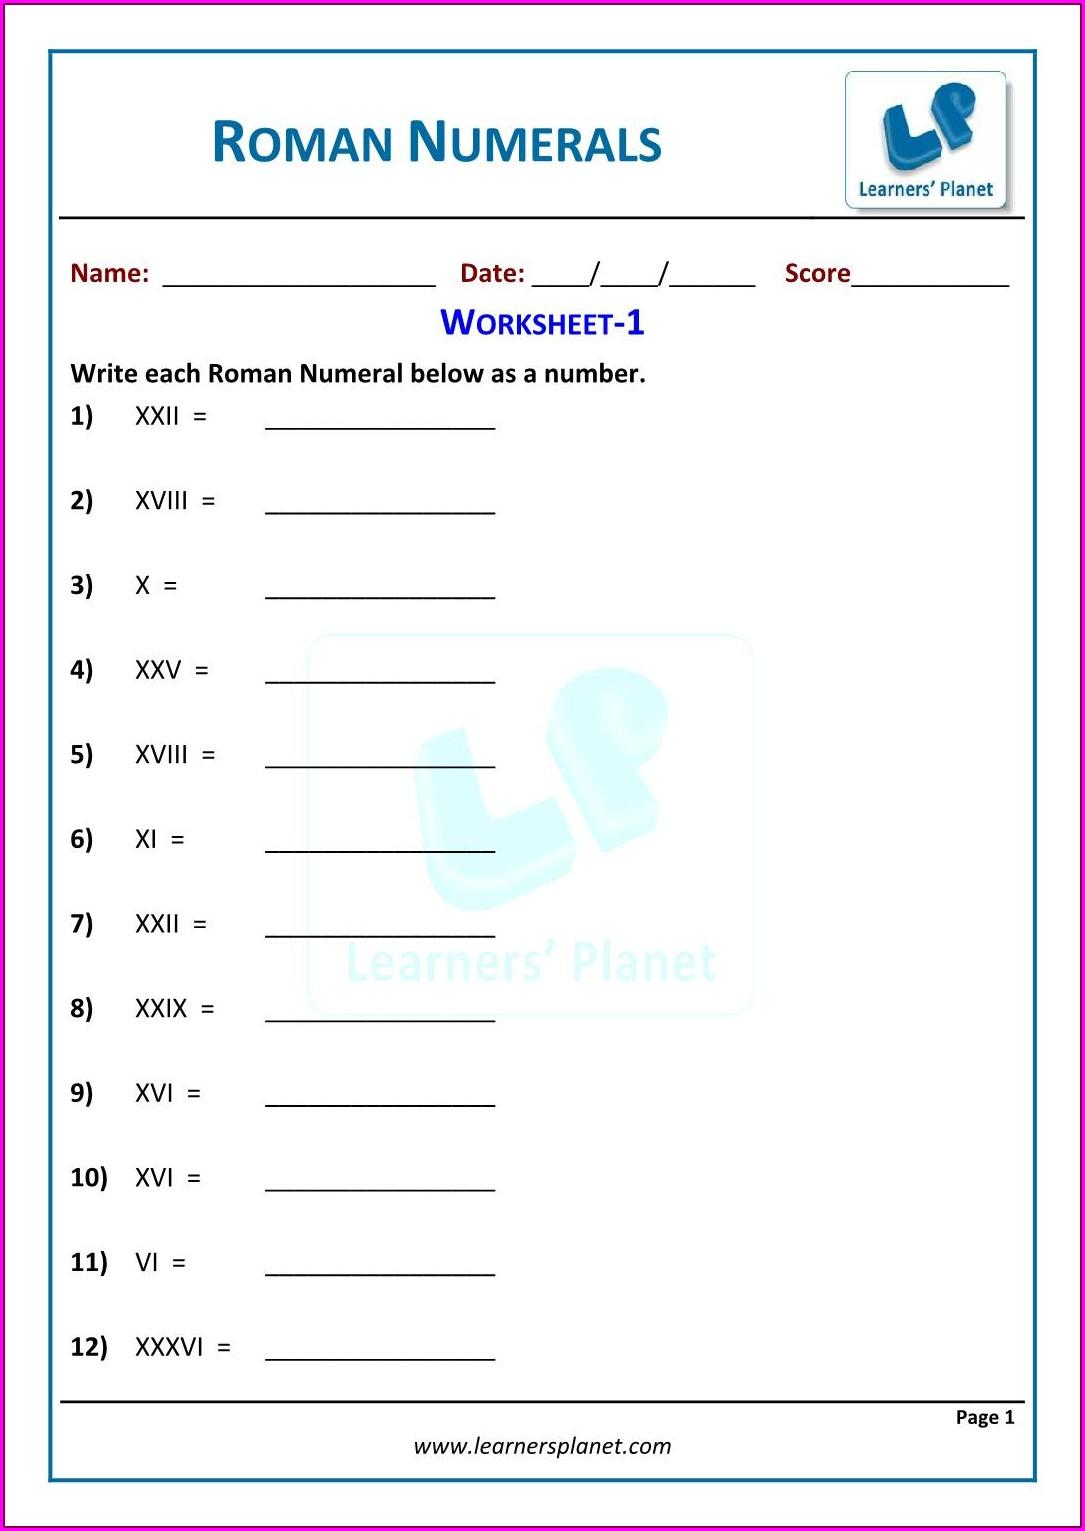 Roman Numerals Worksheet For Grade 2